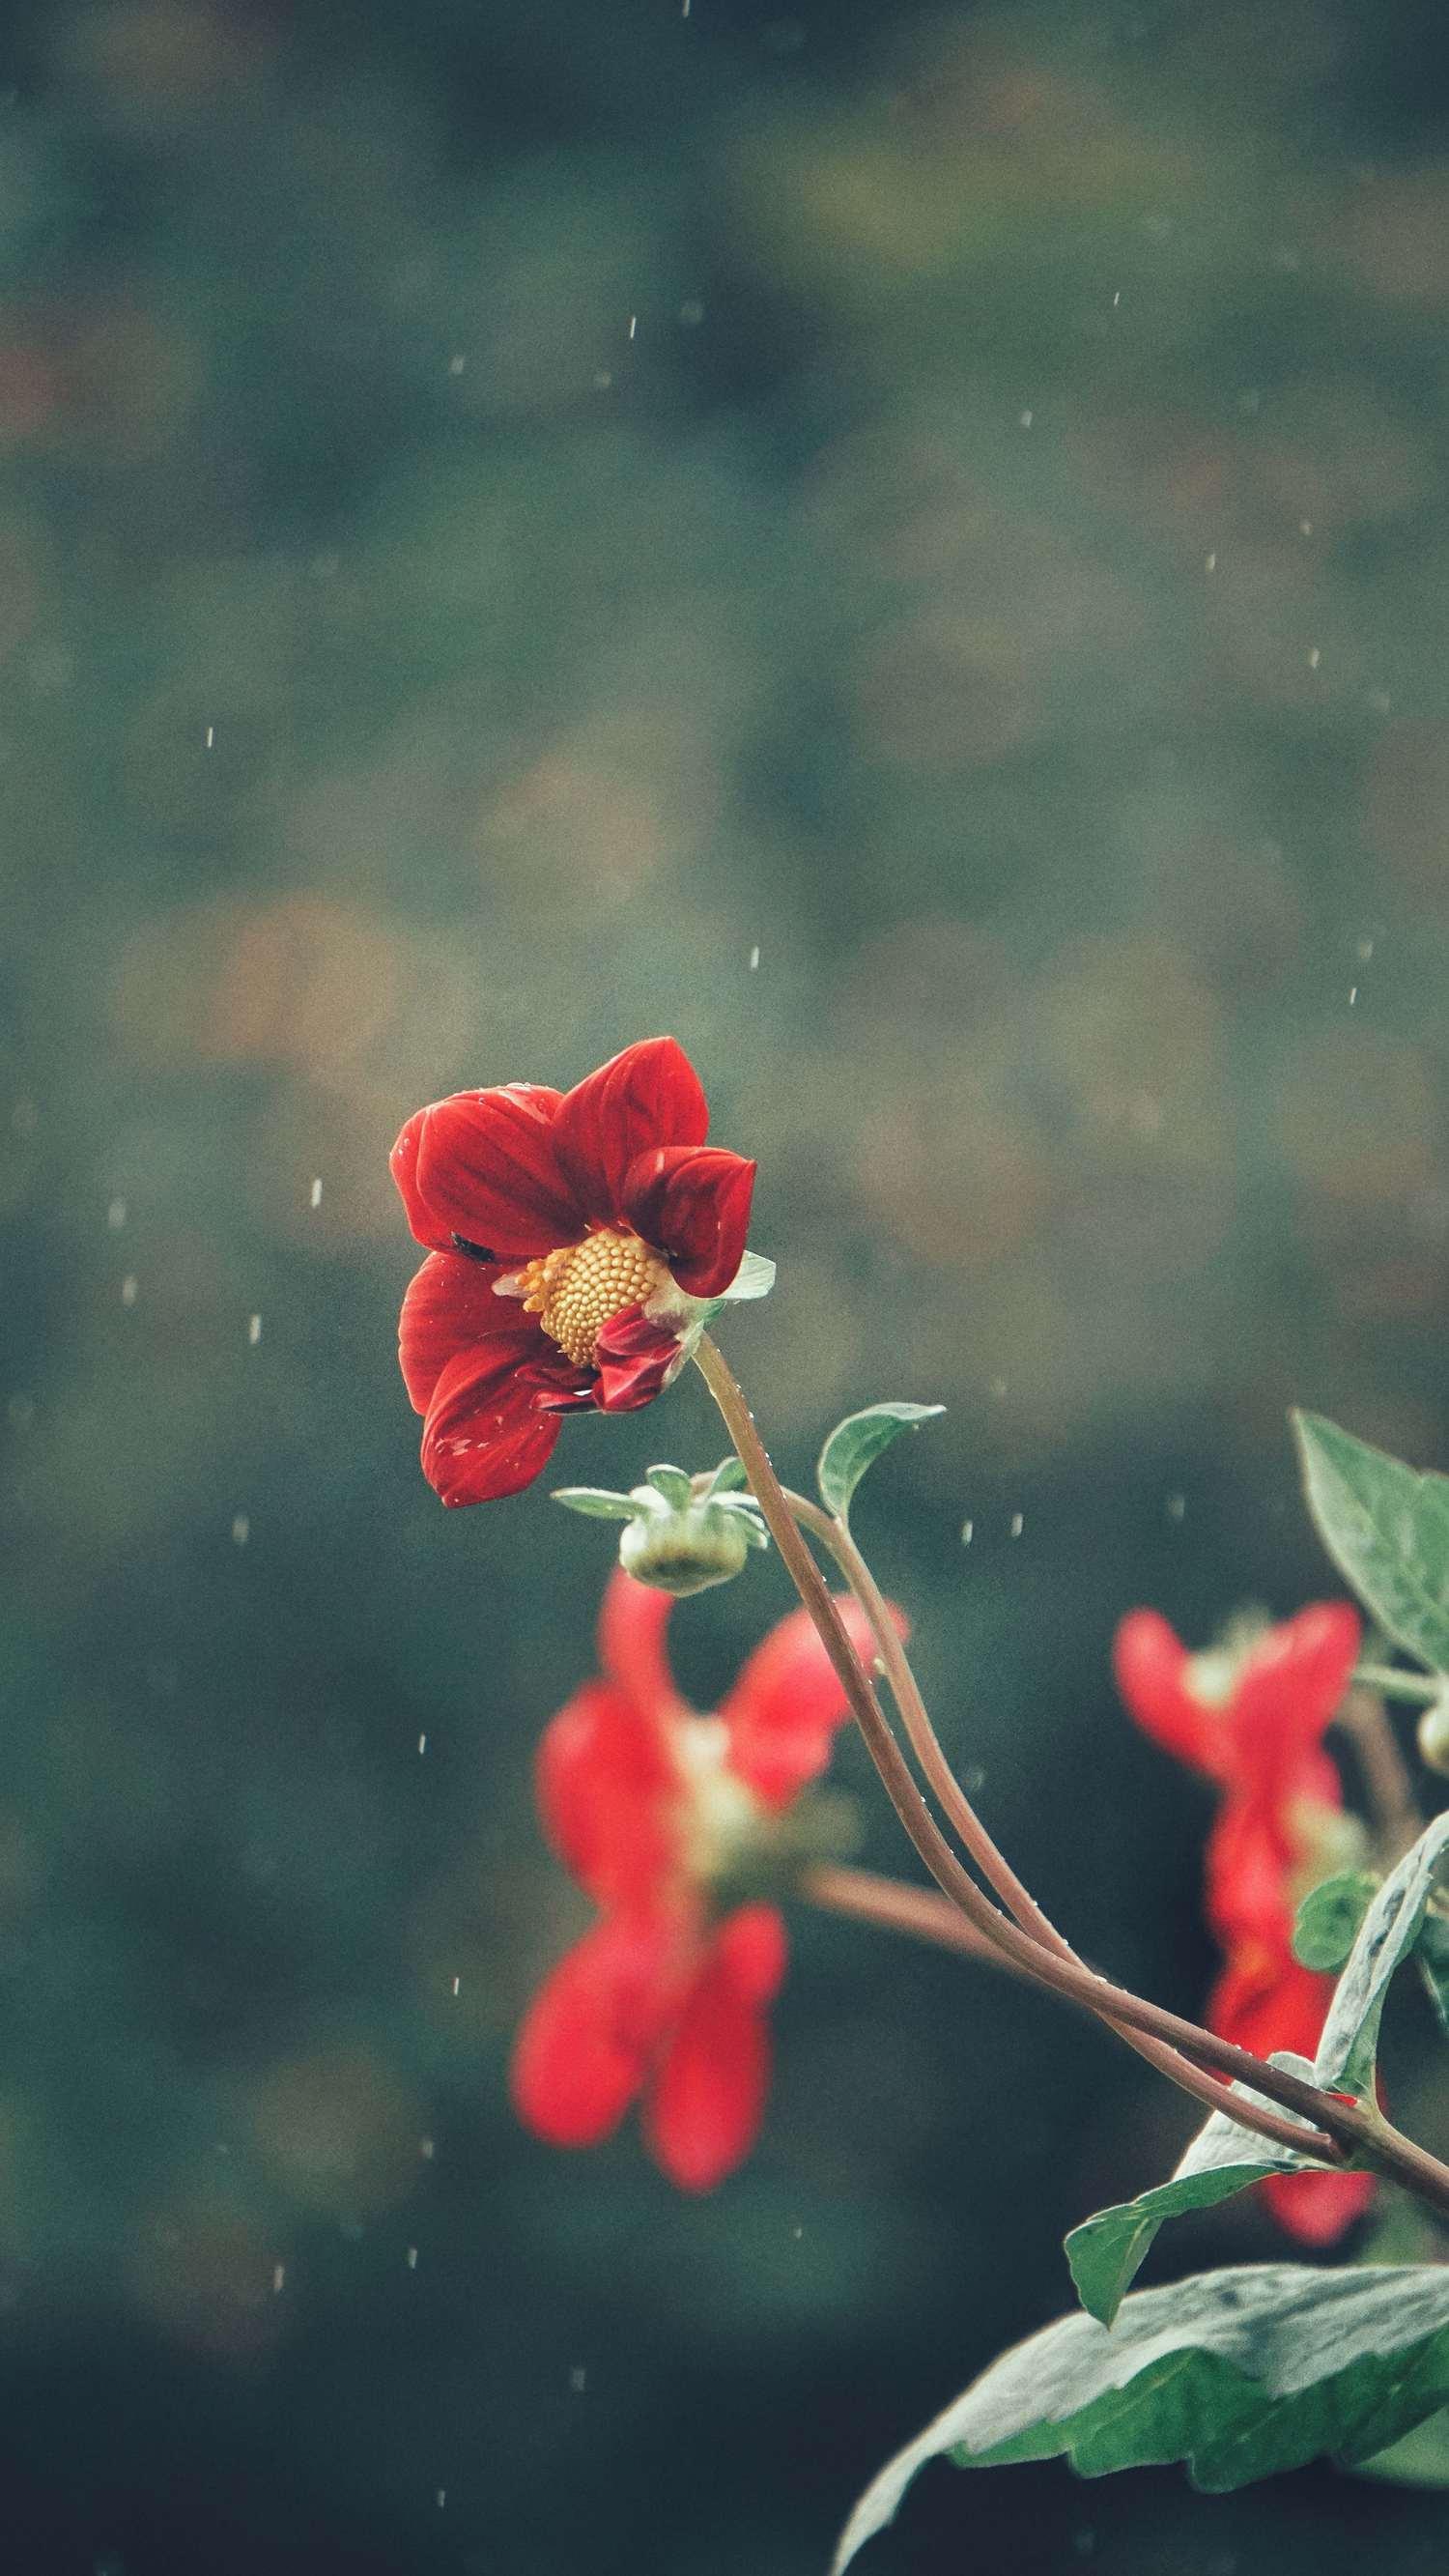 Flor roja fotografiada mientras llueve